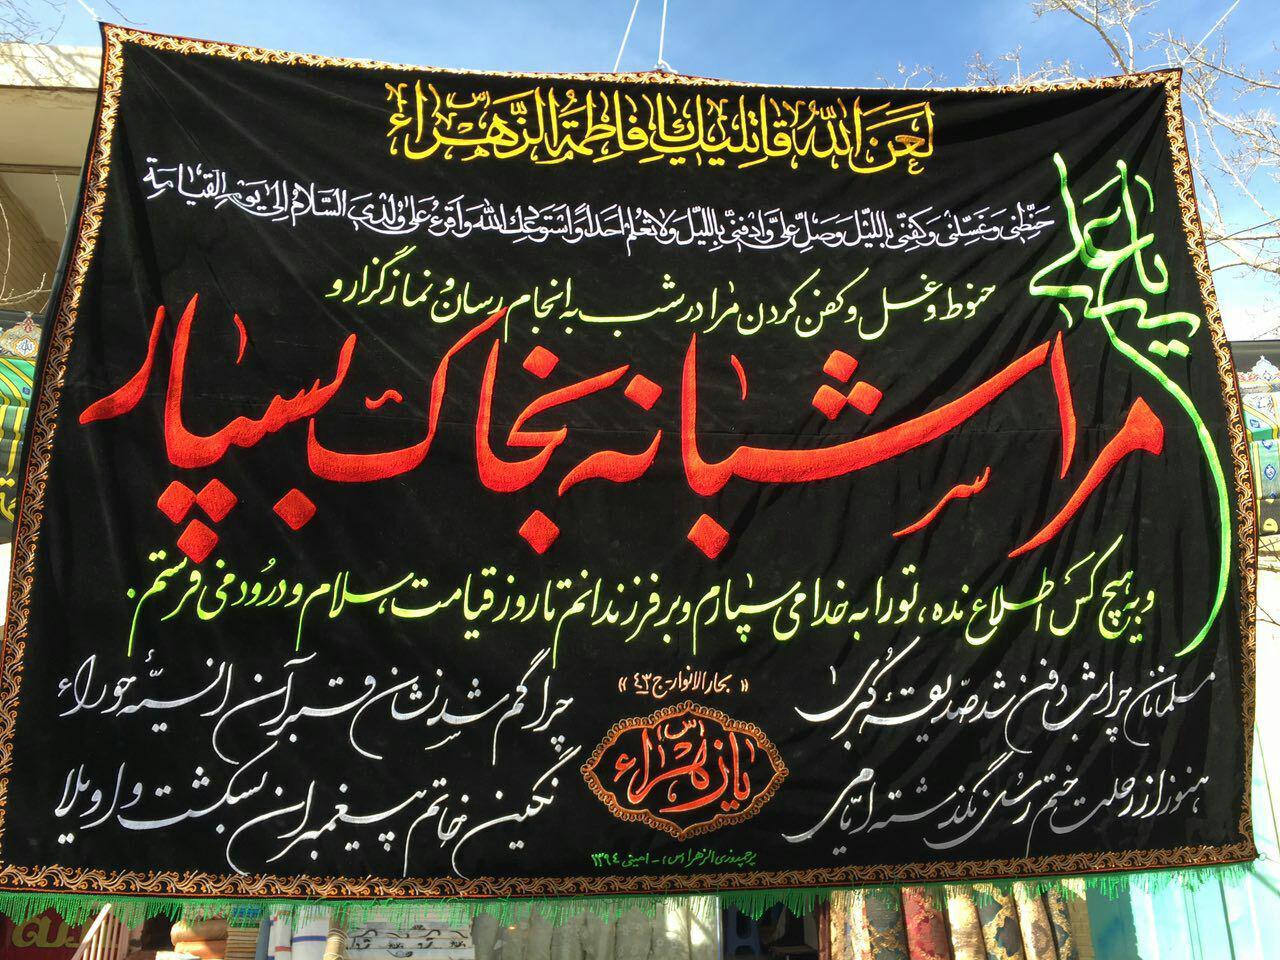 photo 2016 09 03 09 12 23 %پرچم دوزی الزهرا اصفهان